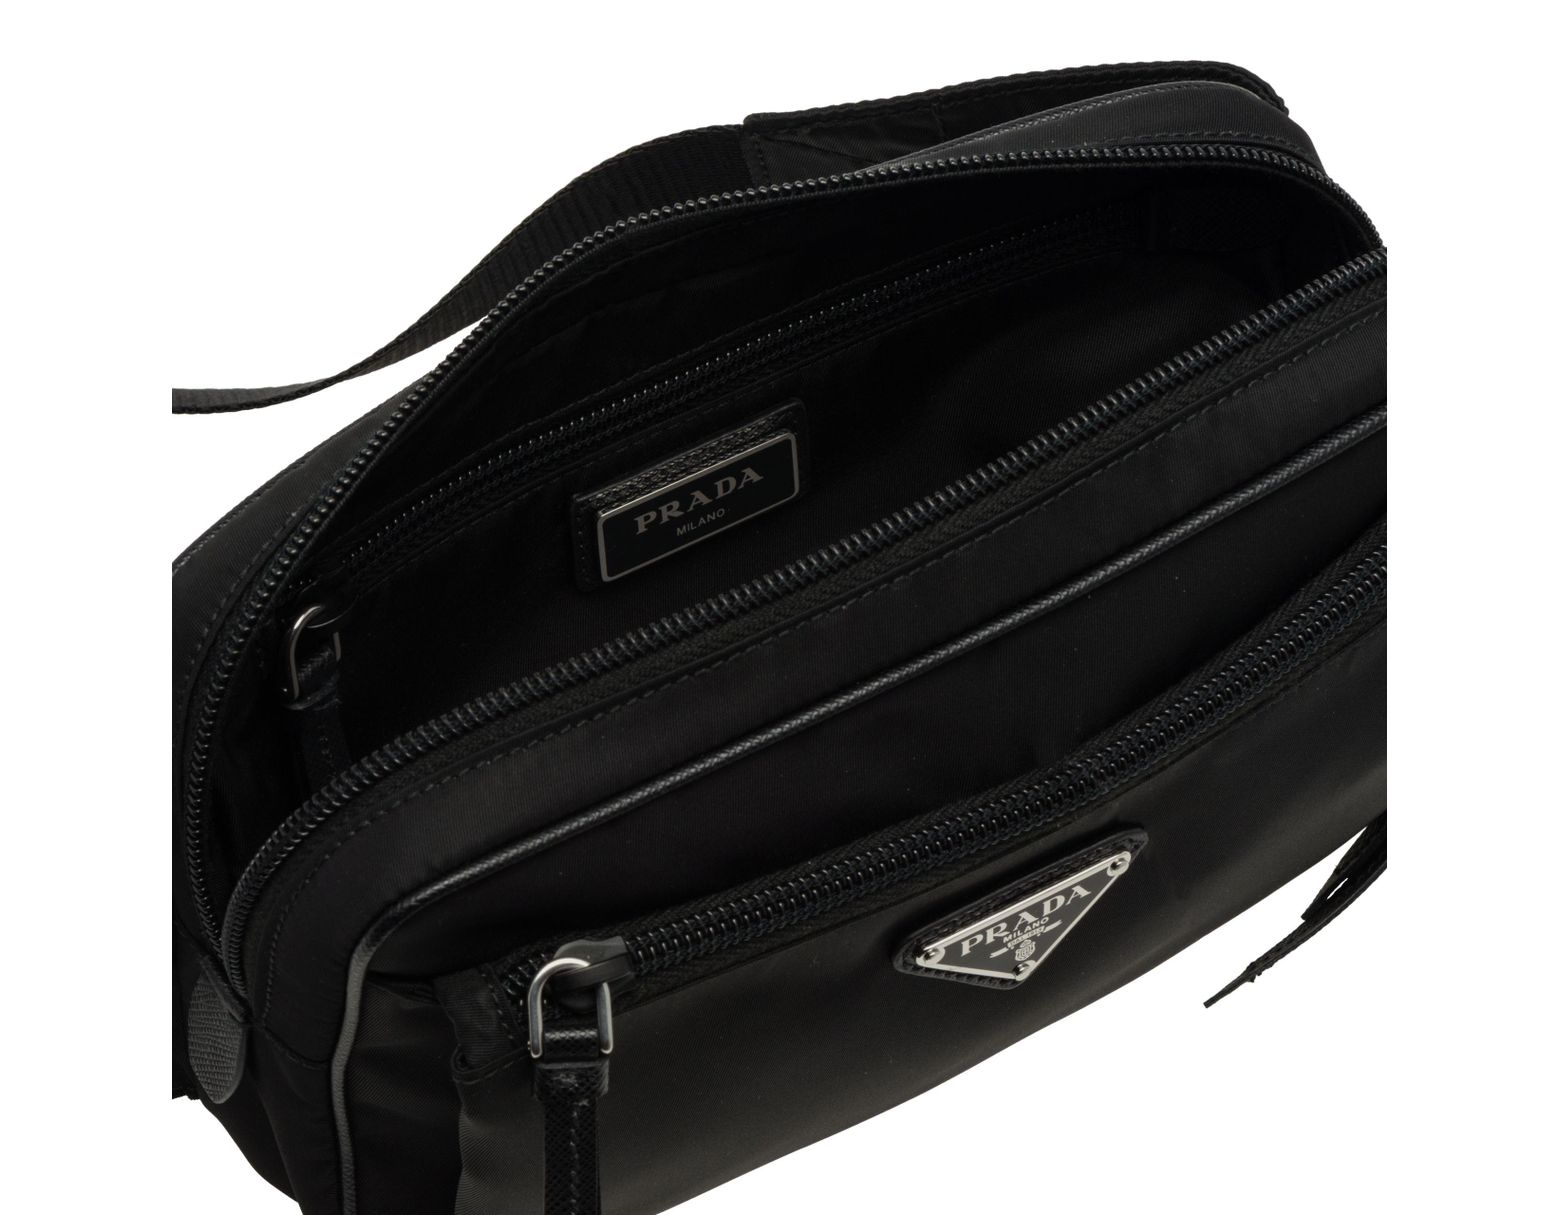 8bf015d931cc Prada Nylon And Leather Belt Bag in Black - Lyst